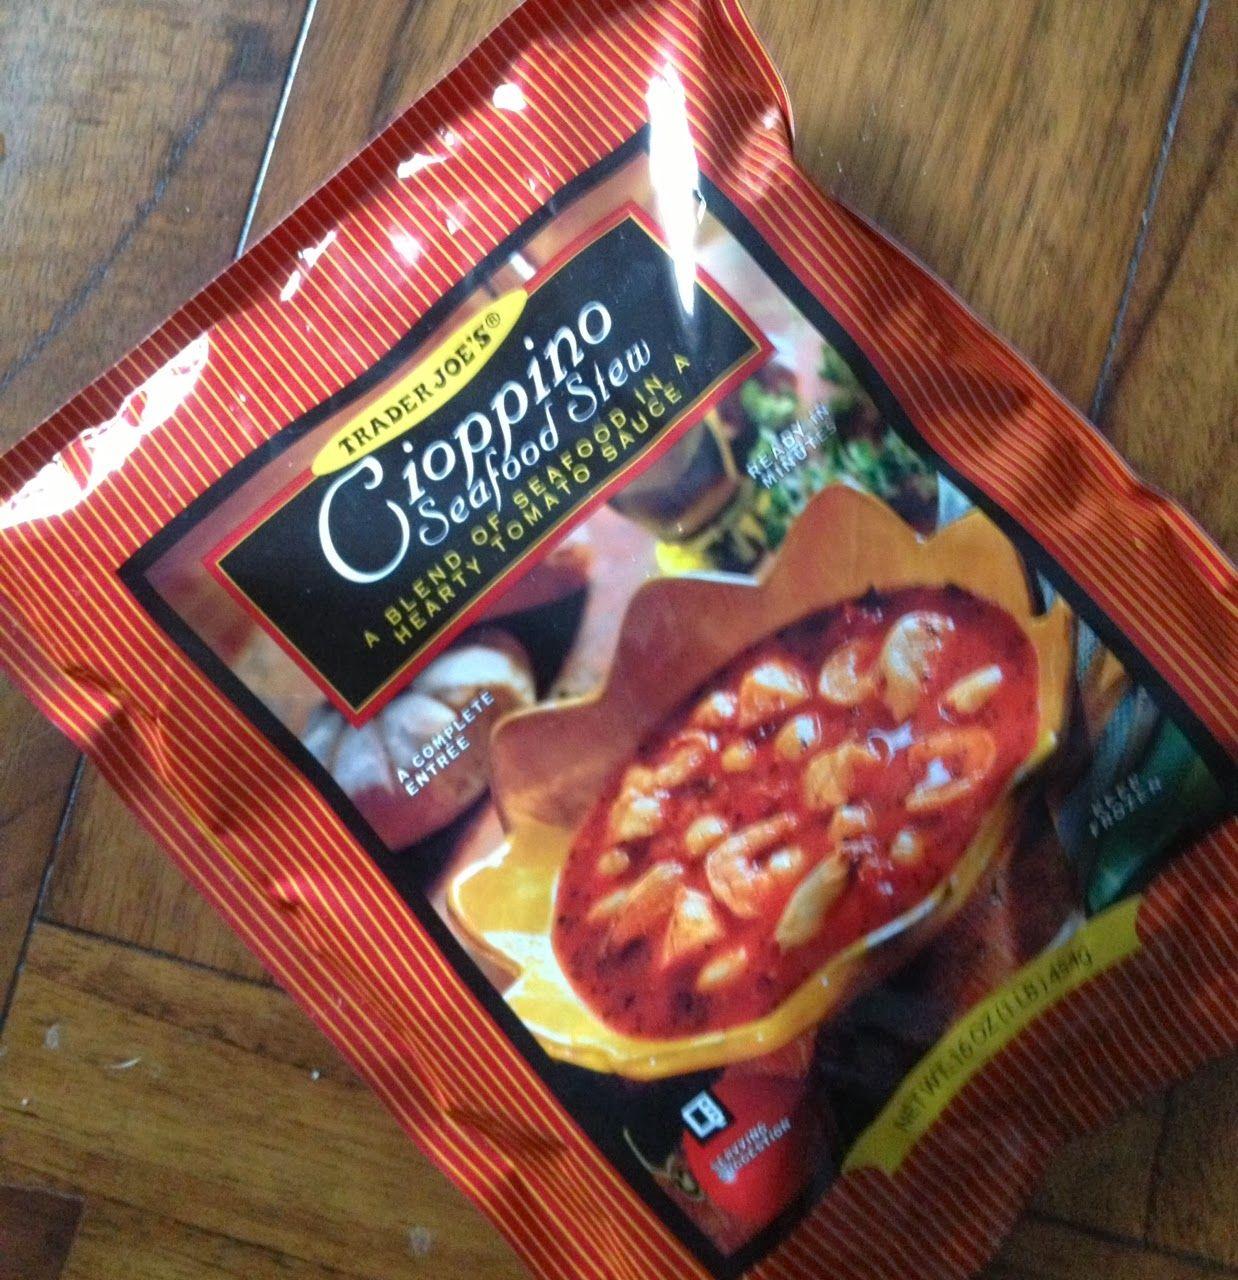 What S Good At Trader Joe S Trader Joe S Cioppino Seafood Stew Seafood Stew Fish Stew Recipes Trader Joes